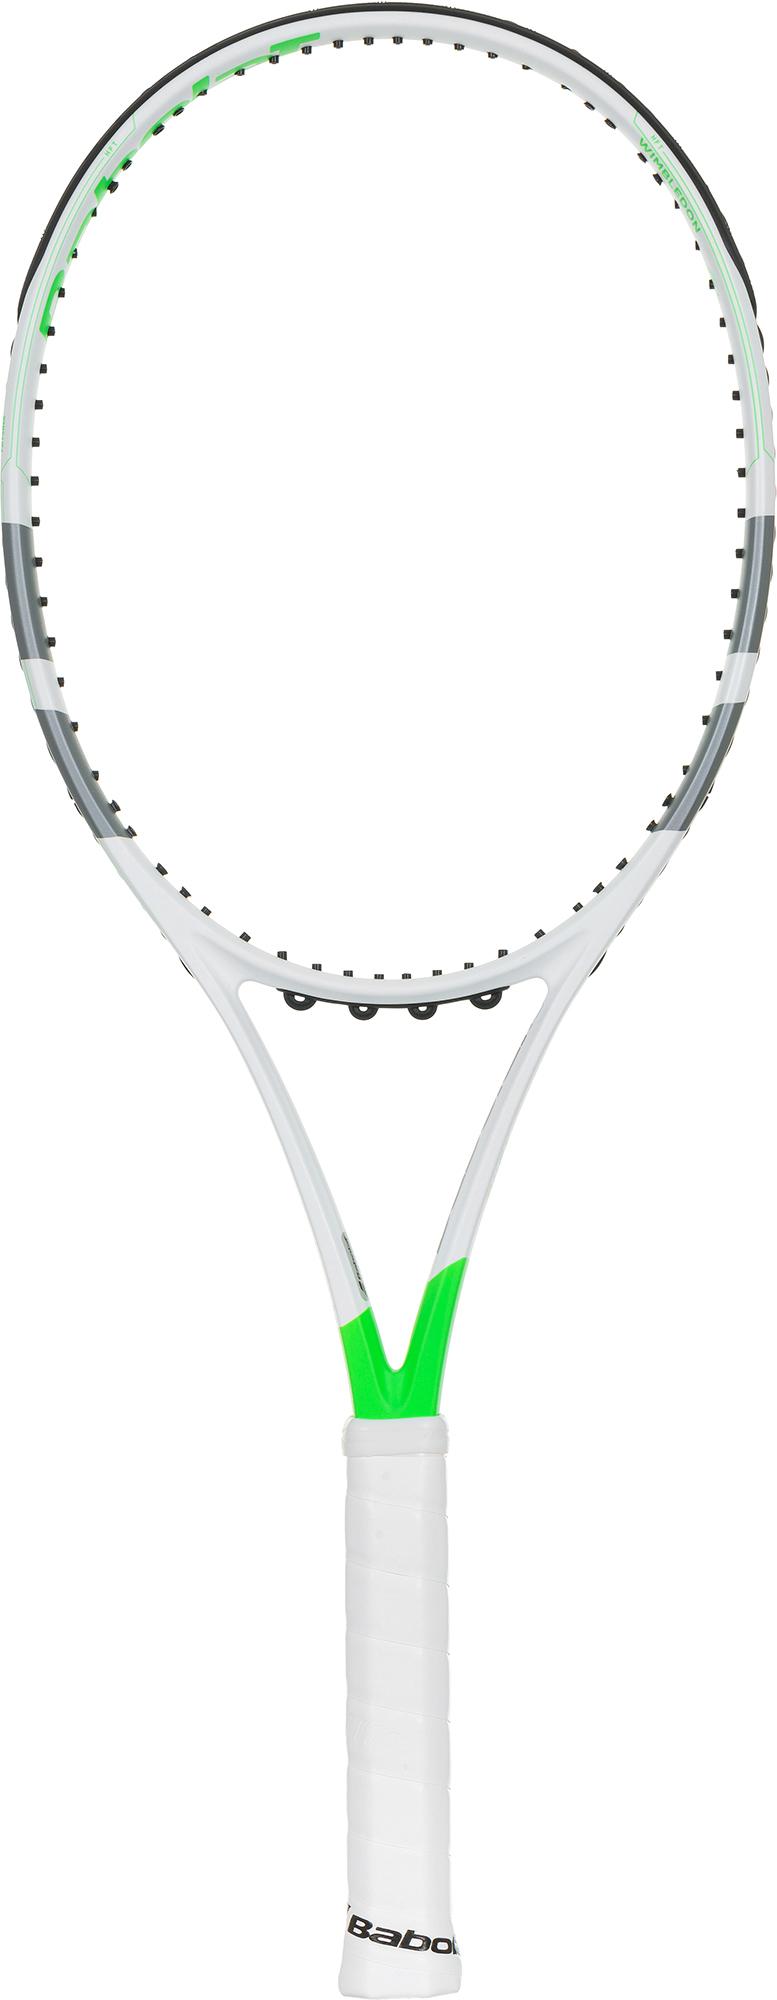 Babolat Ракетка для большого тенниса Babolat Pure Strike Lite 27', размер 3 babolat набор мячей для большого тенниса babolat red foam x3 размер без размера